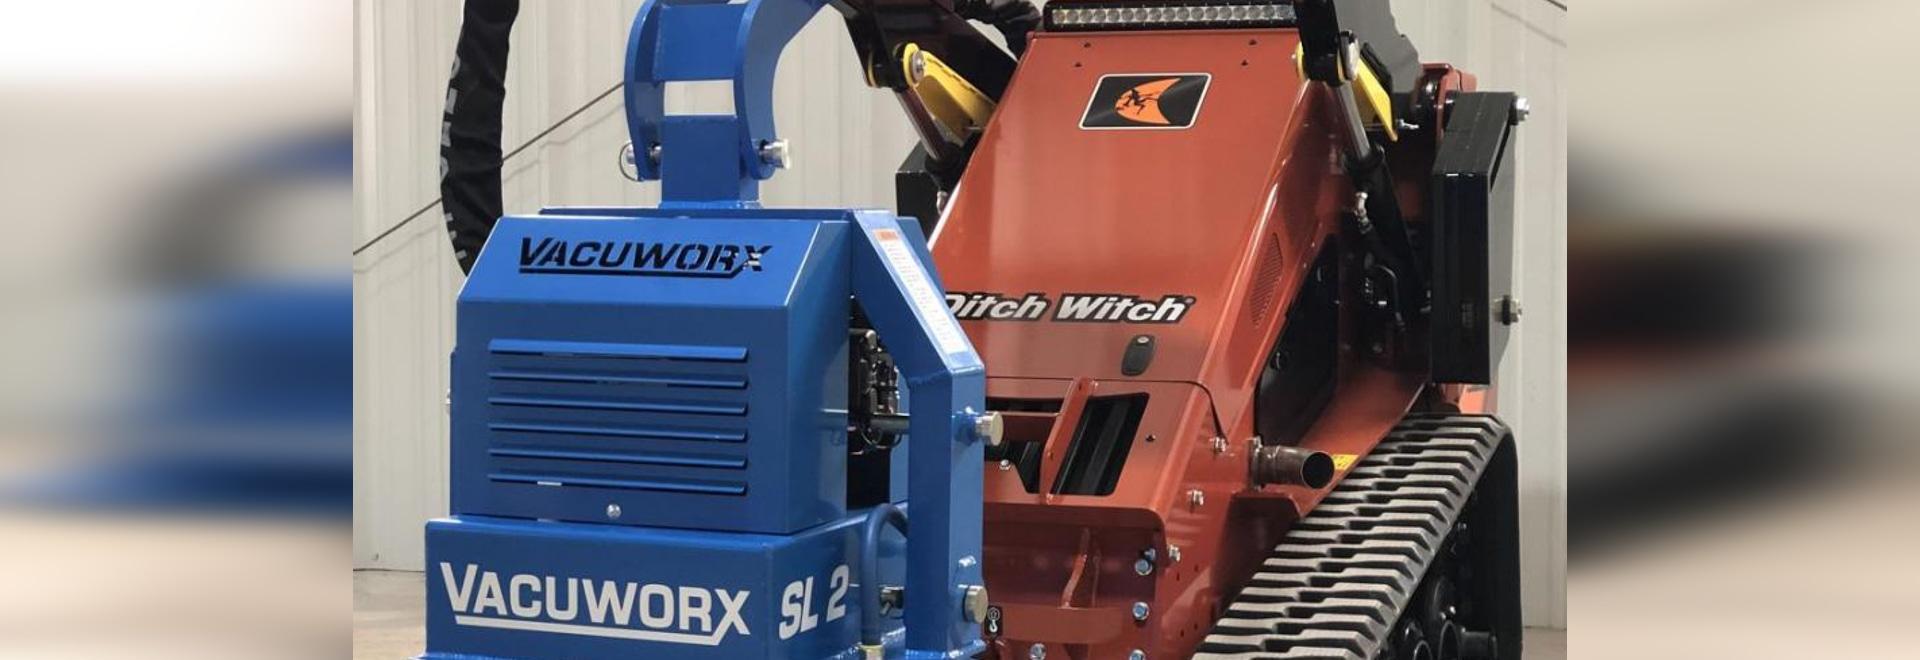 Vacuworx SL 2 Lifting System Improvements